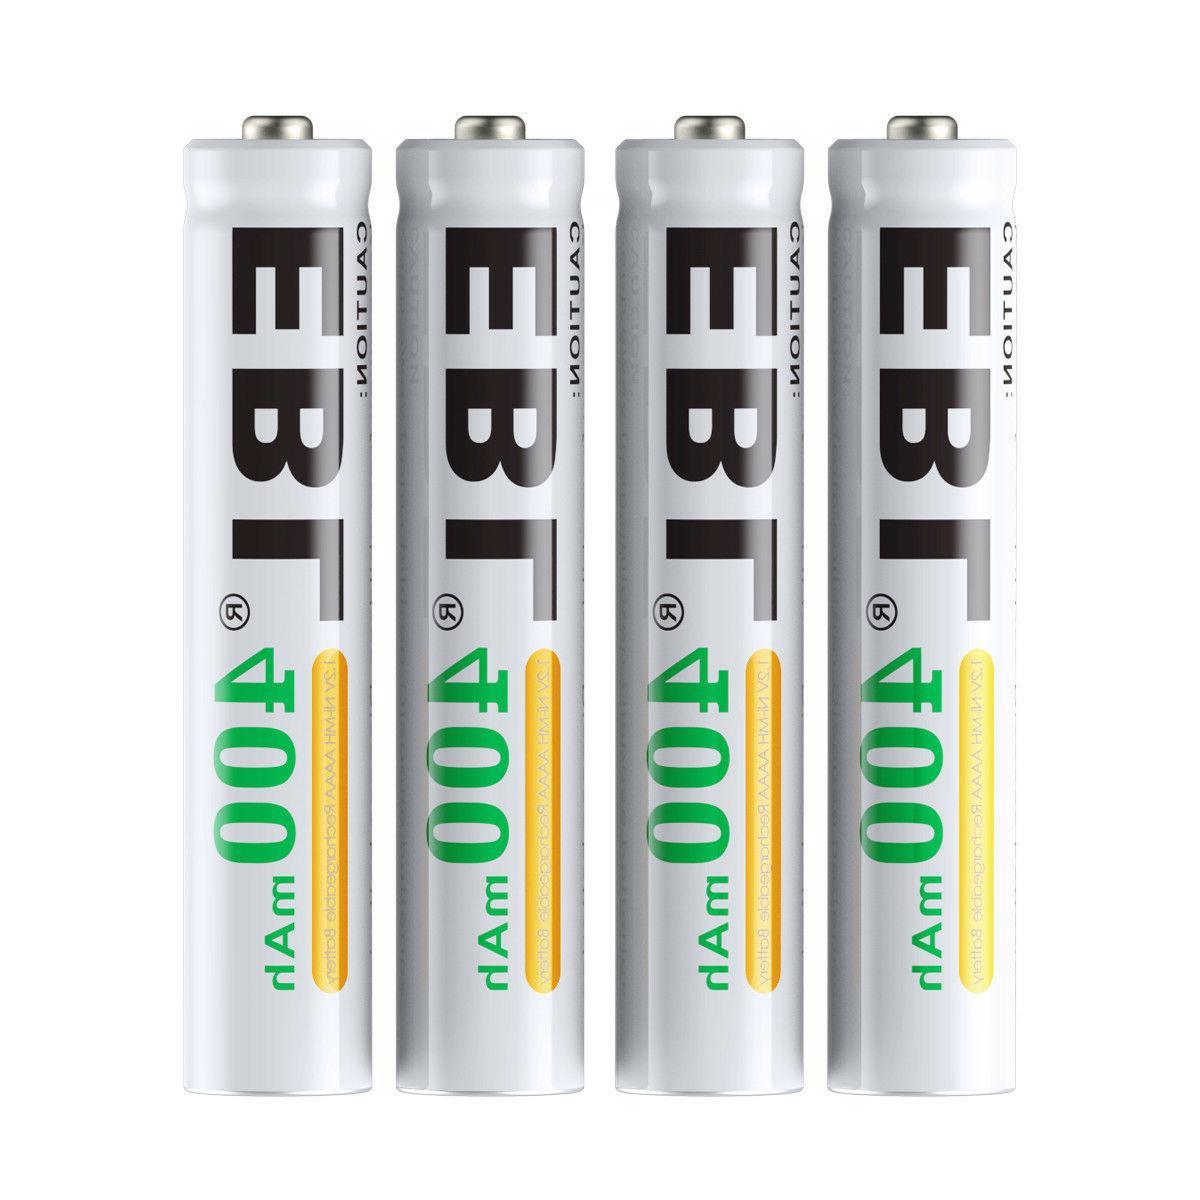 4x400mAh Rechargeable AAAA Batteries Replace Pen